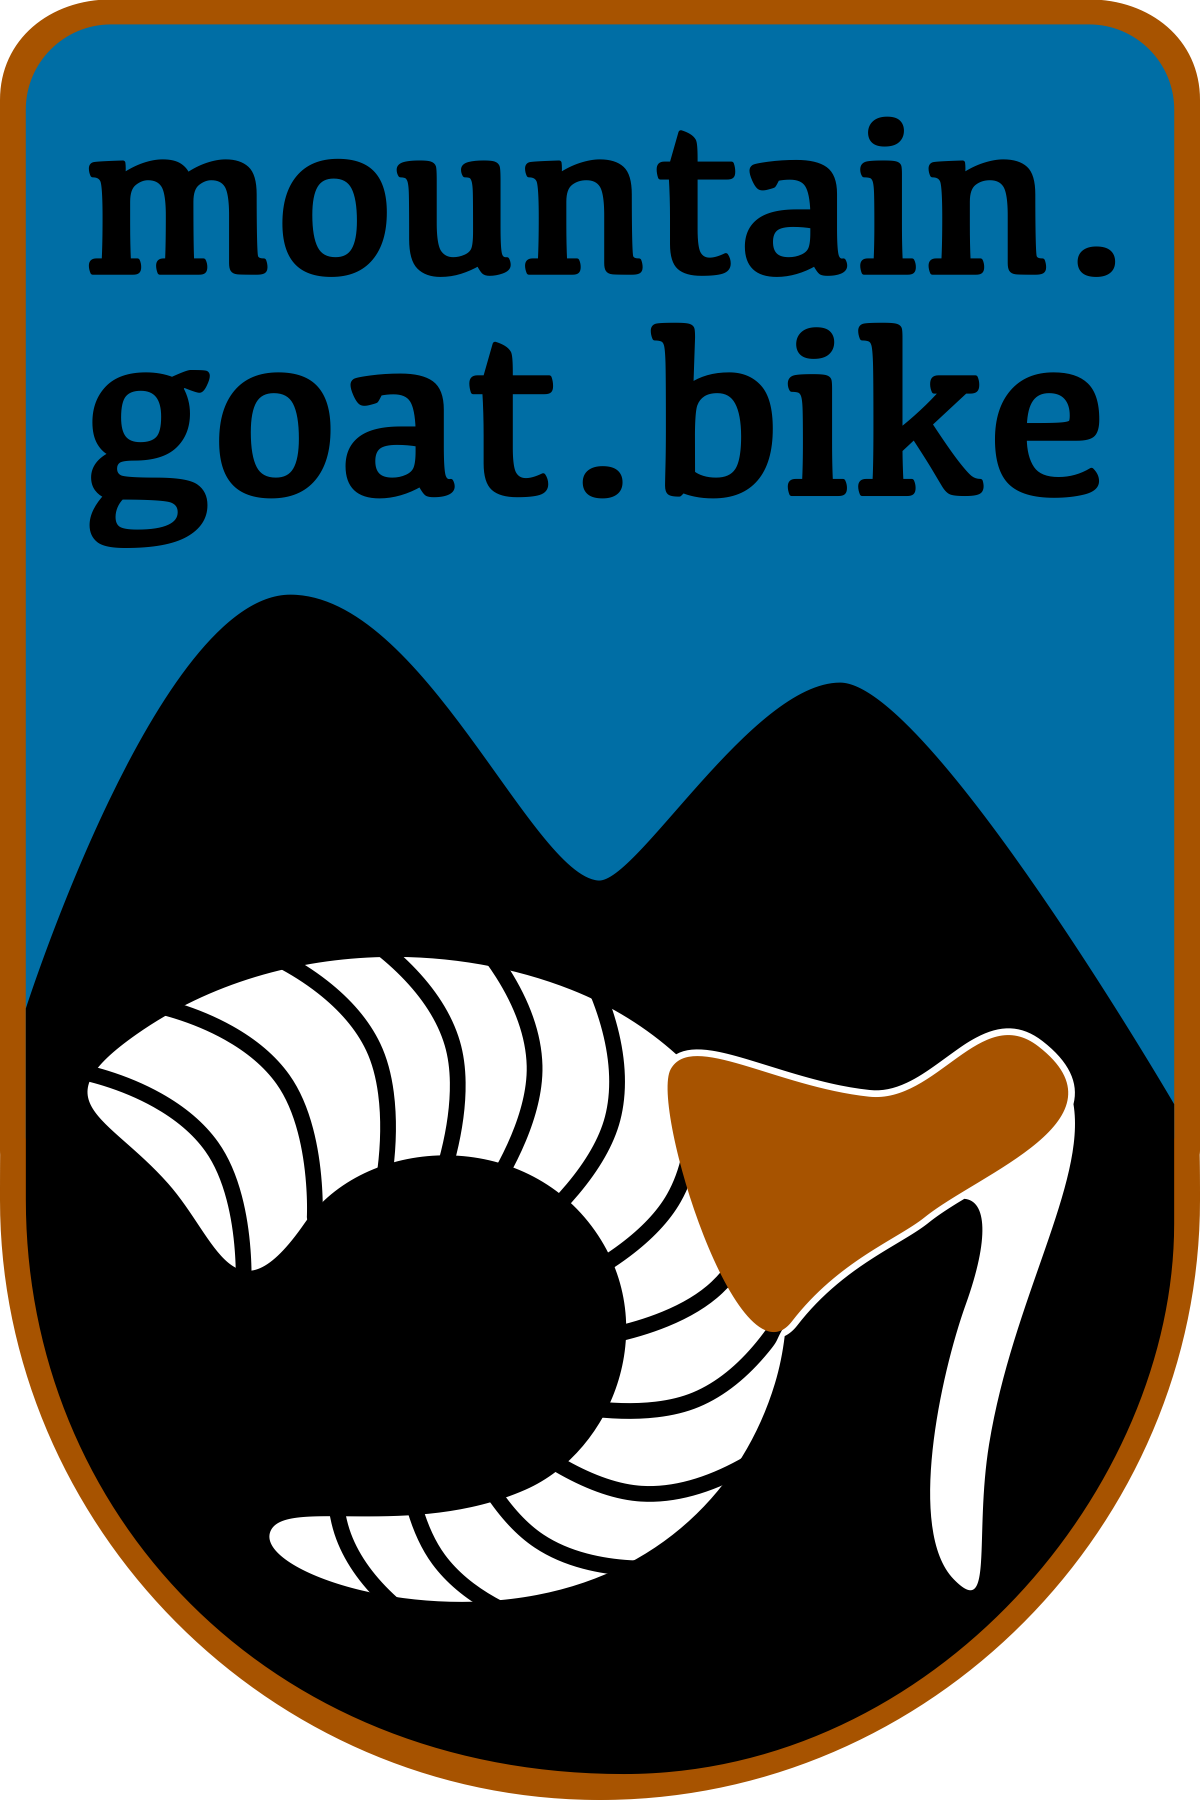 mountain.goat.bike